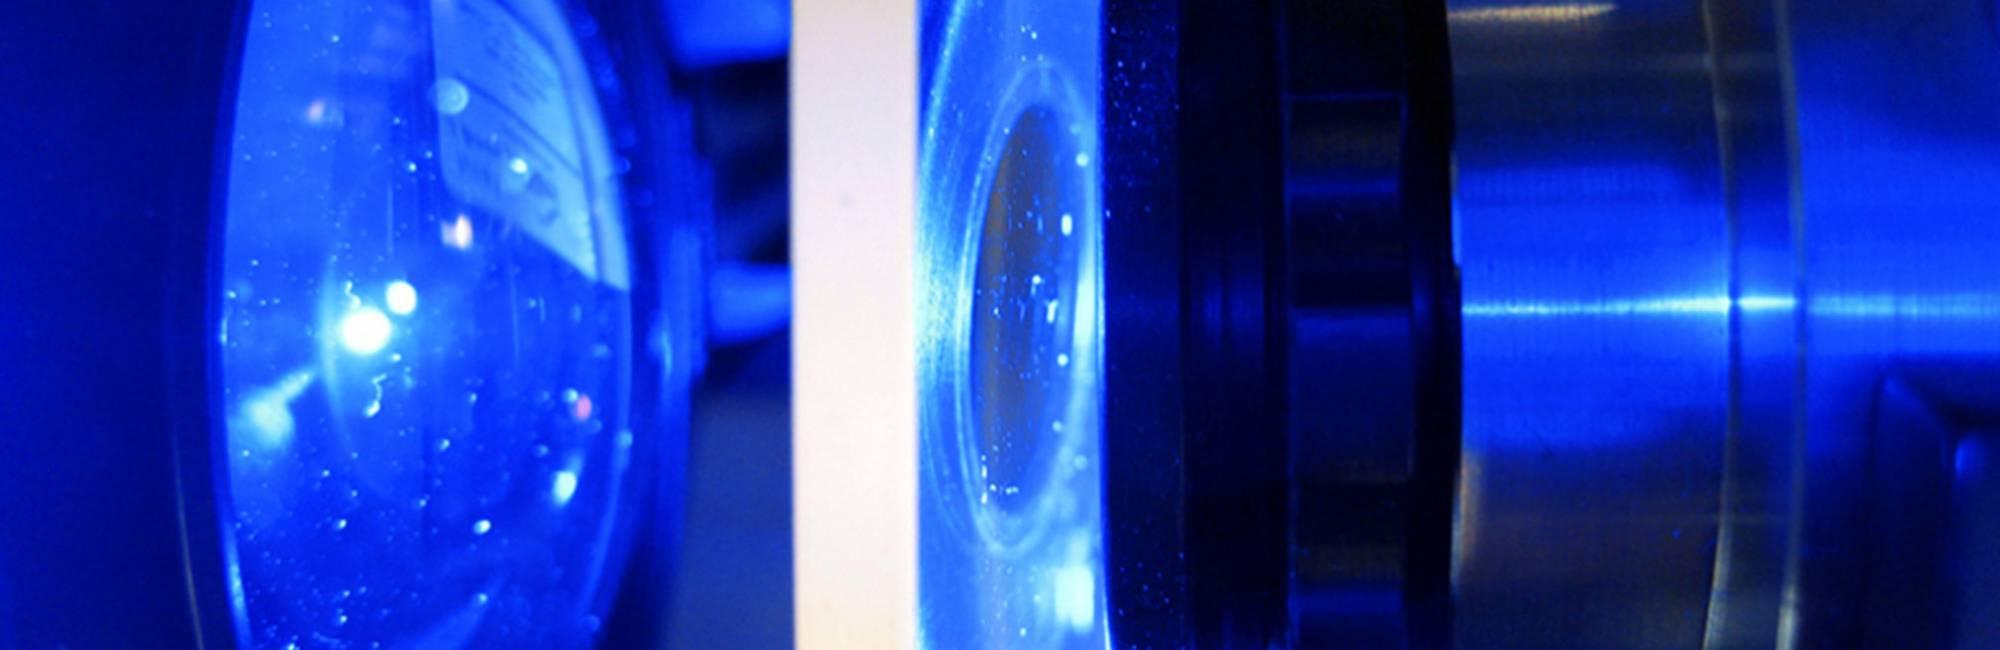 optical spectroscopic instruments